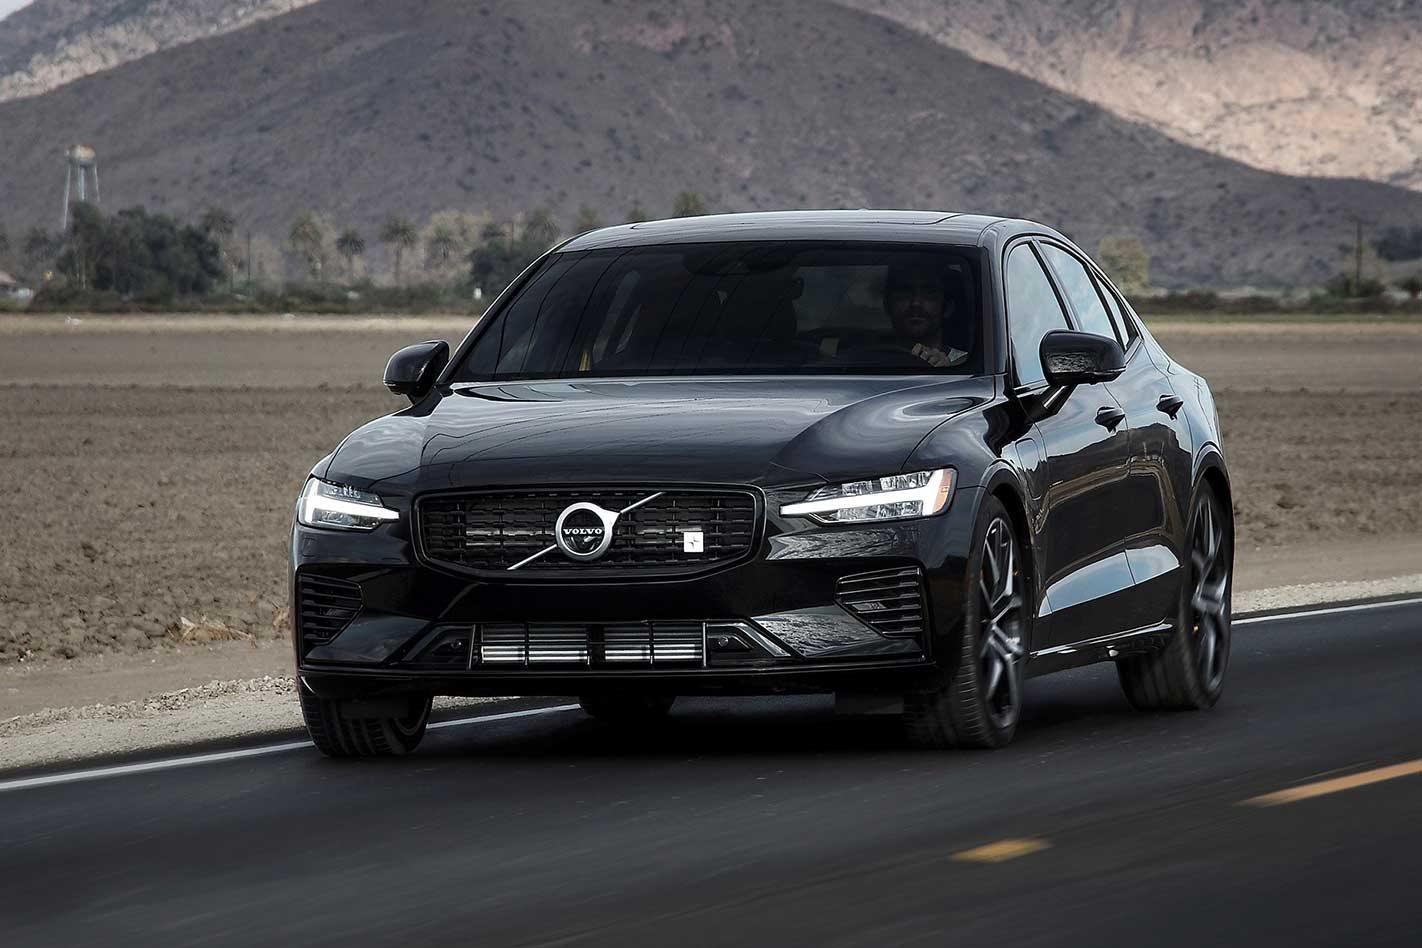 2019 Volvo S60 T8 Polestar performance review